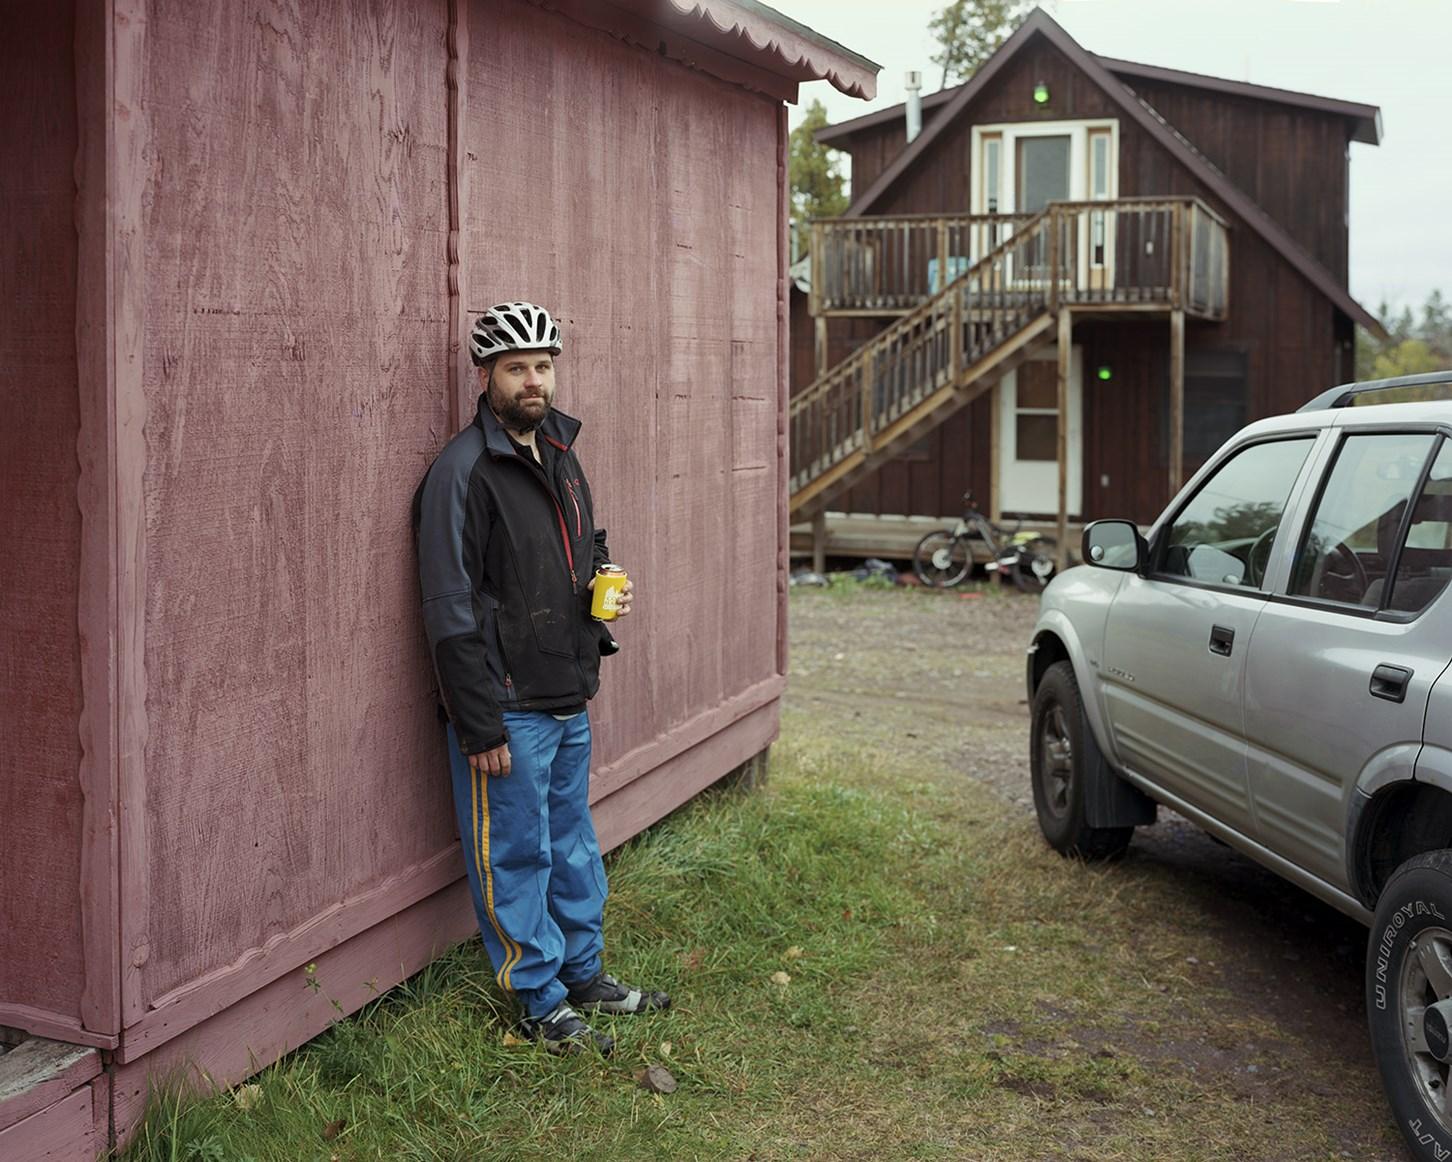 Pete, Copper Harbor, Minnesota, October 2012